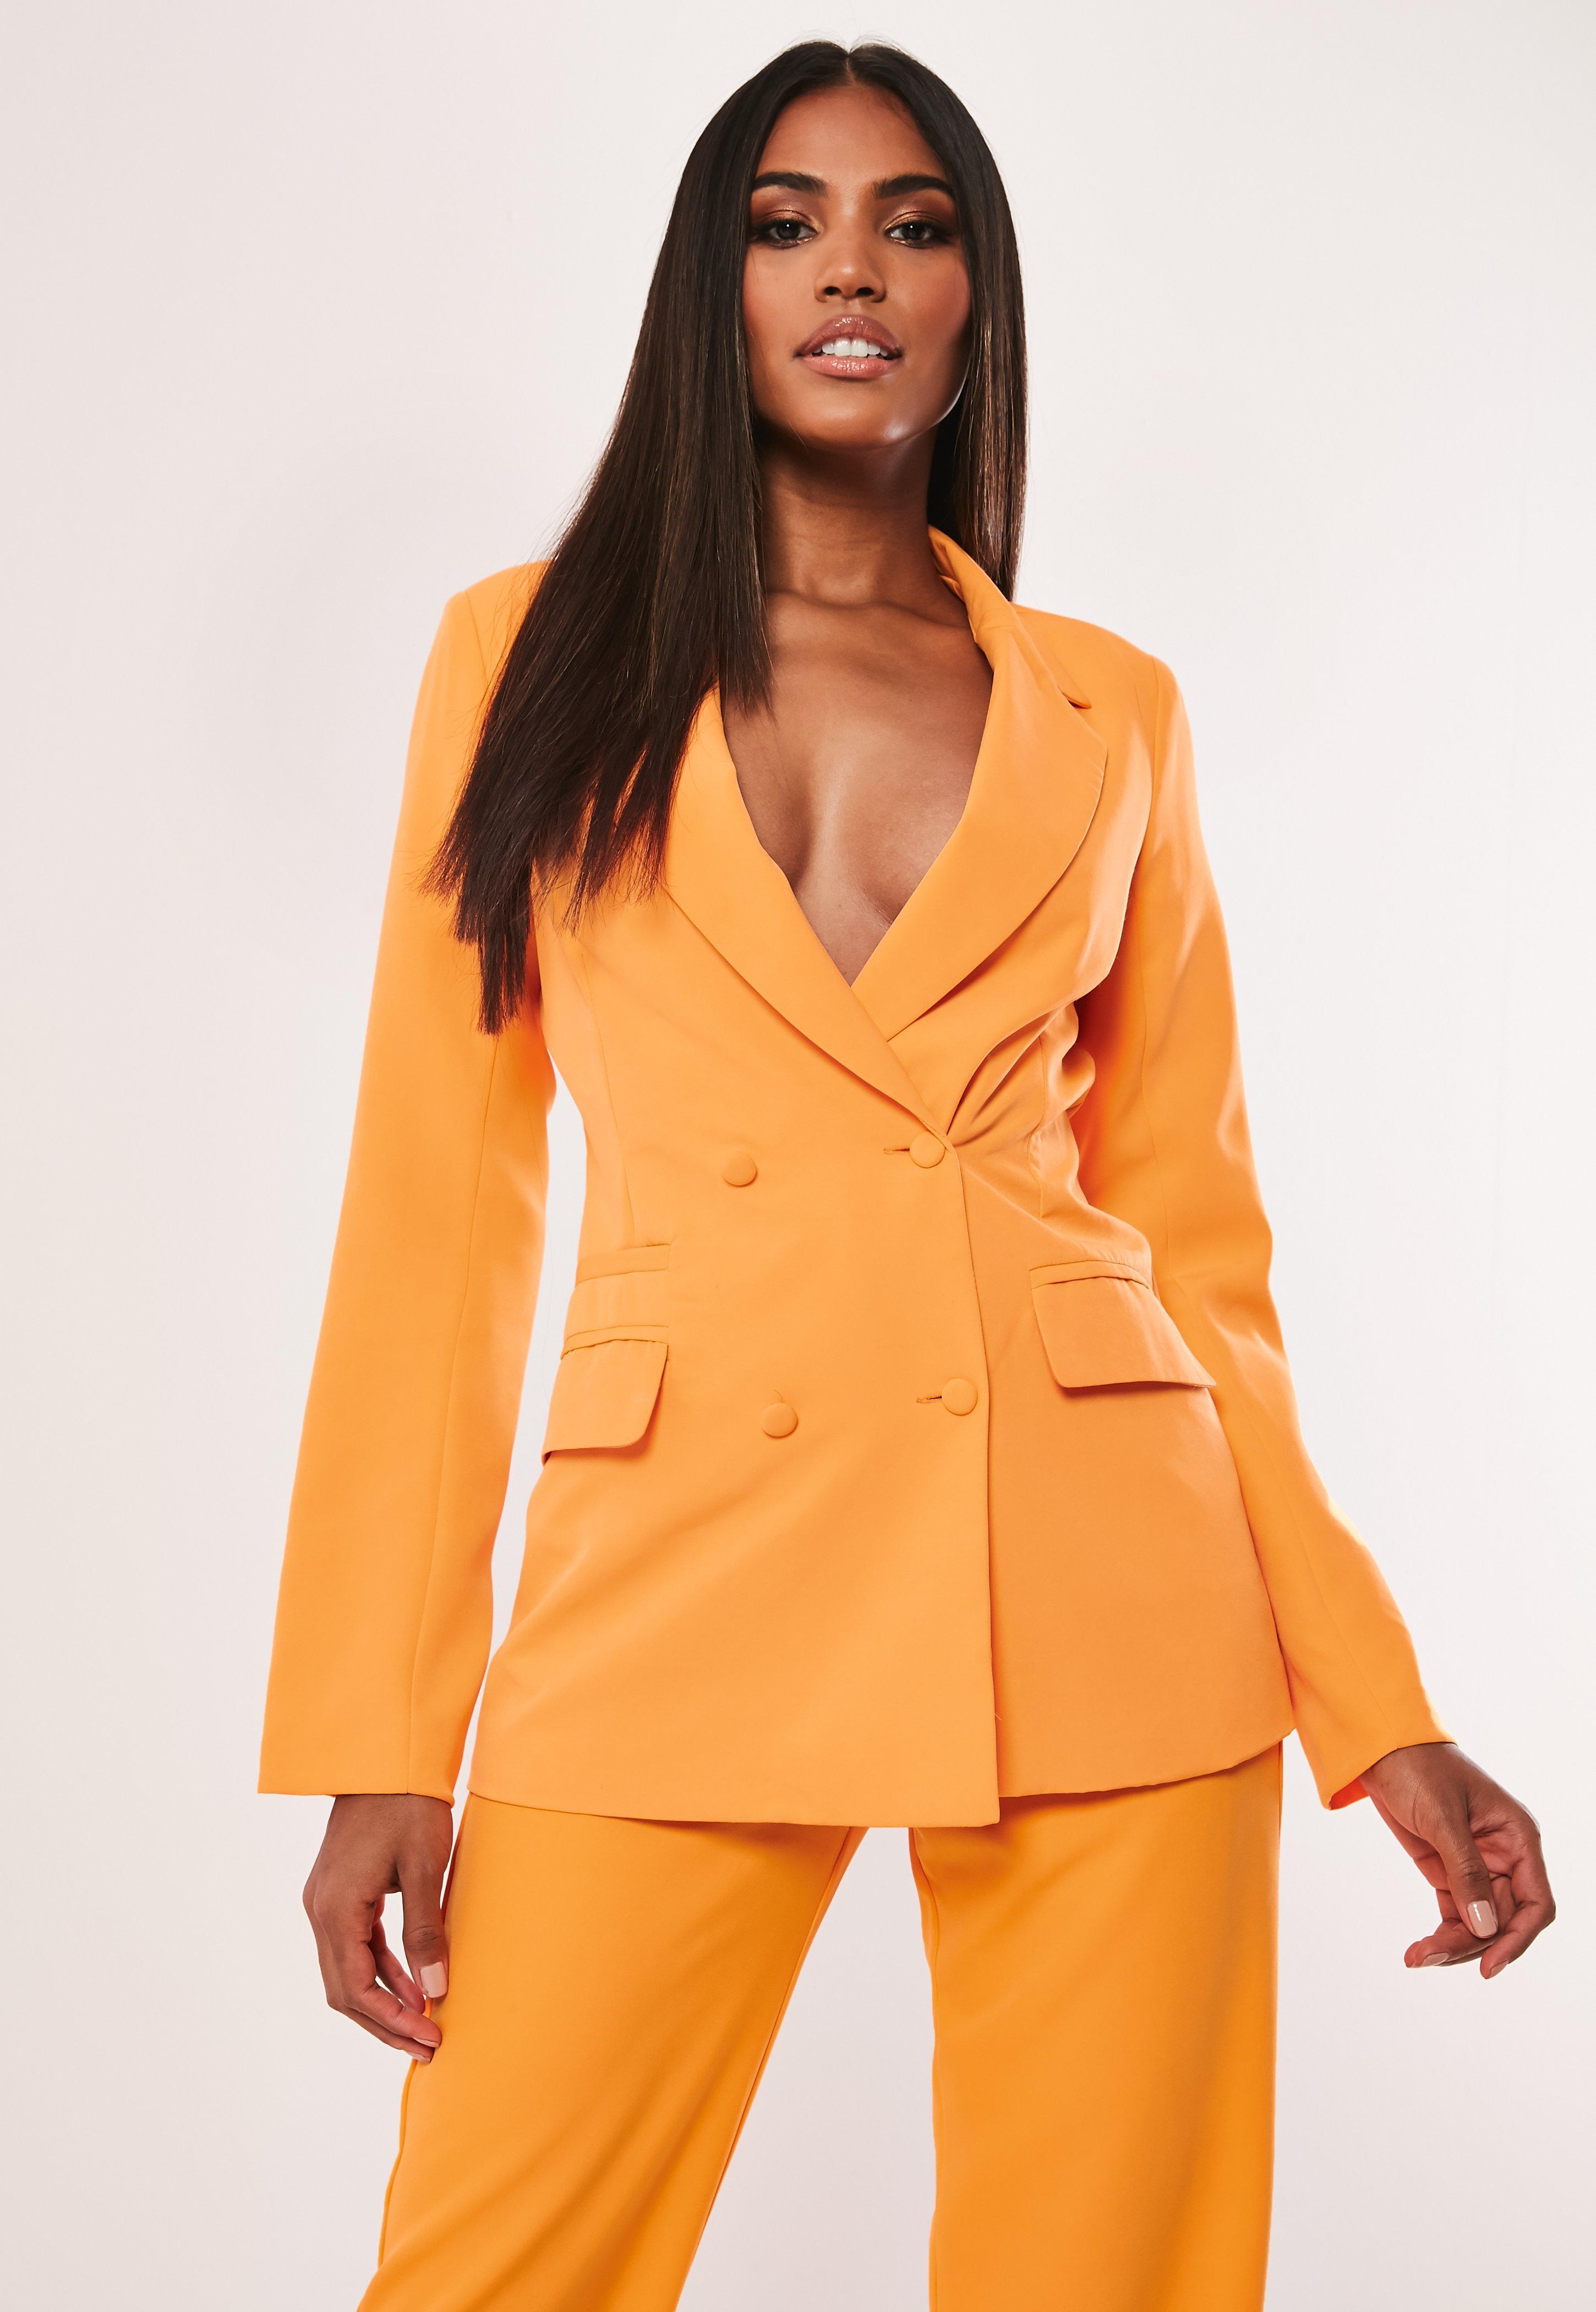 5fb28a07ec03 Blazers for Women - Shop Smart   Tweed Blazers UK - Missguided